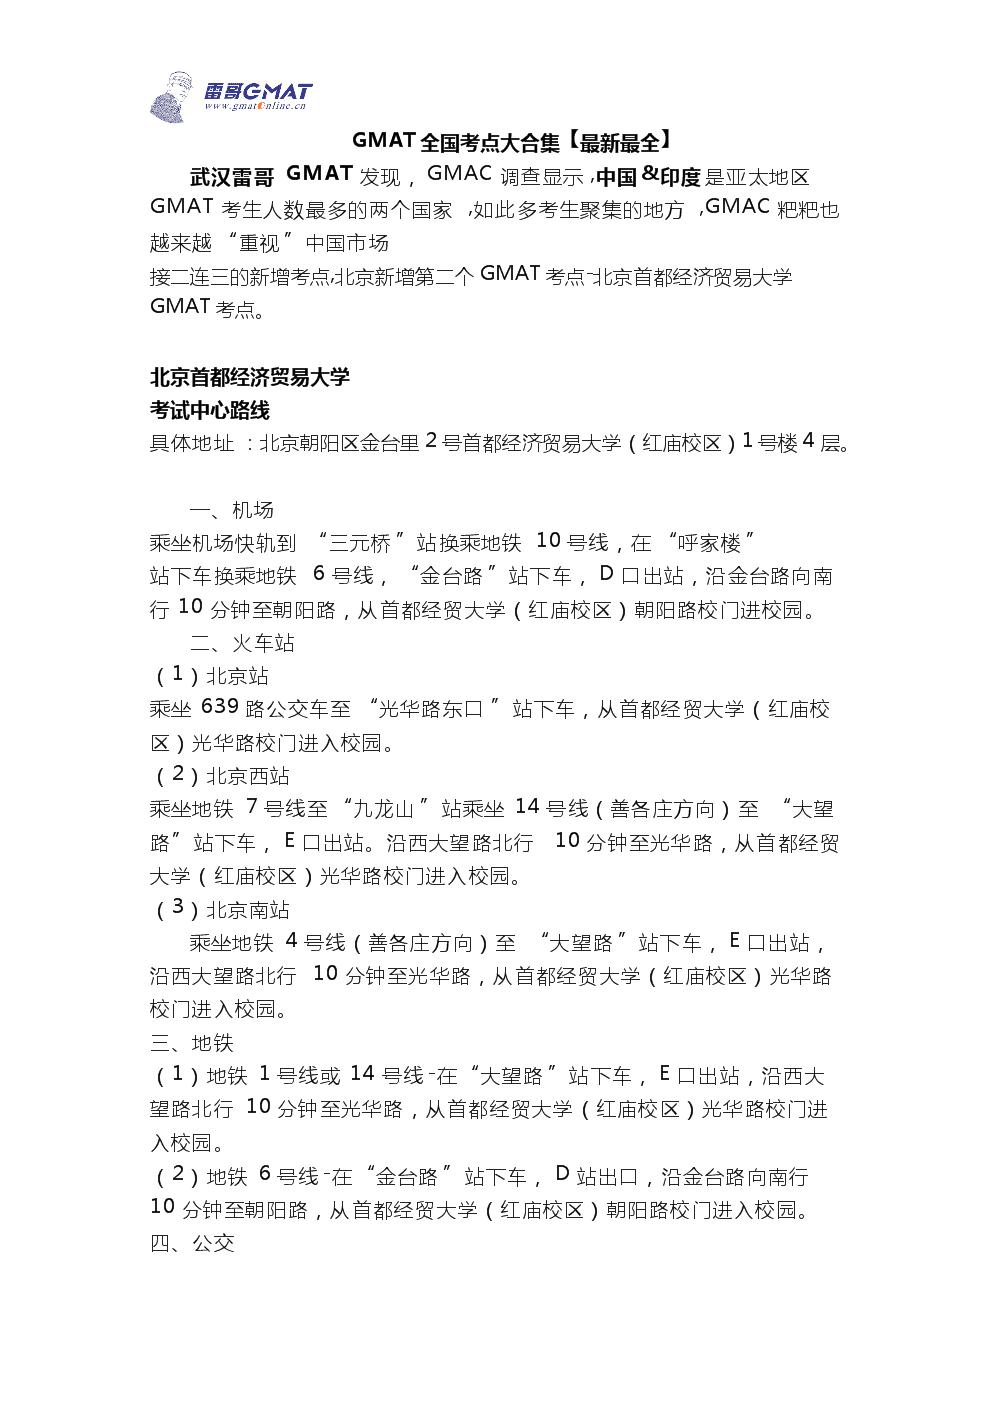 GMAT全国考点大合集【最新最全】.doc